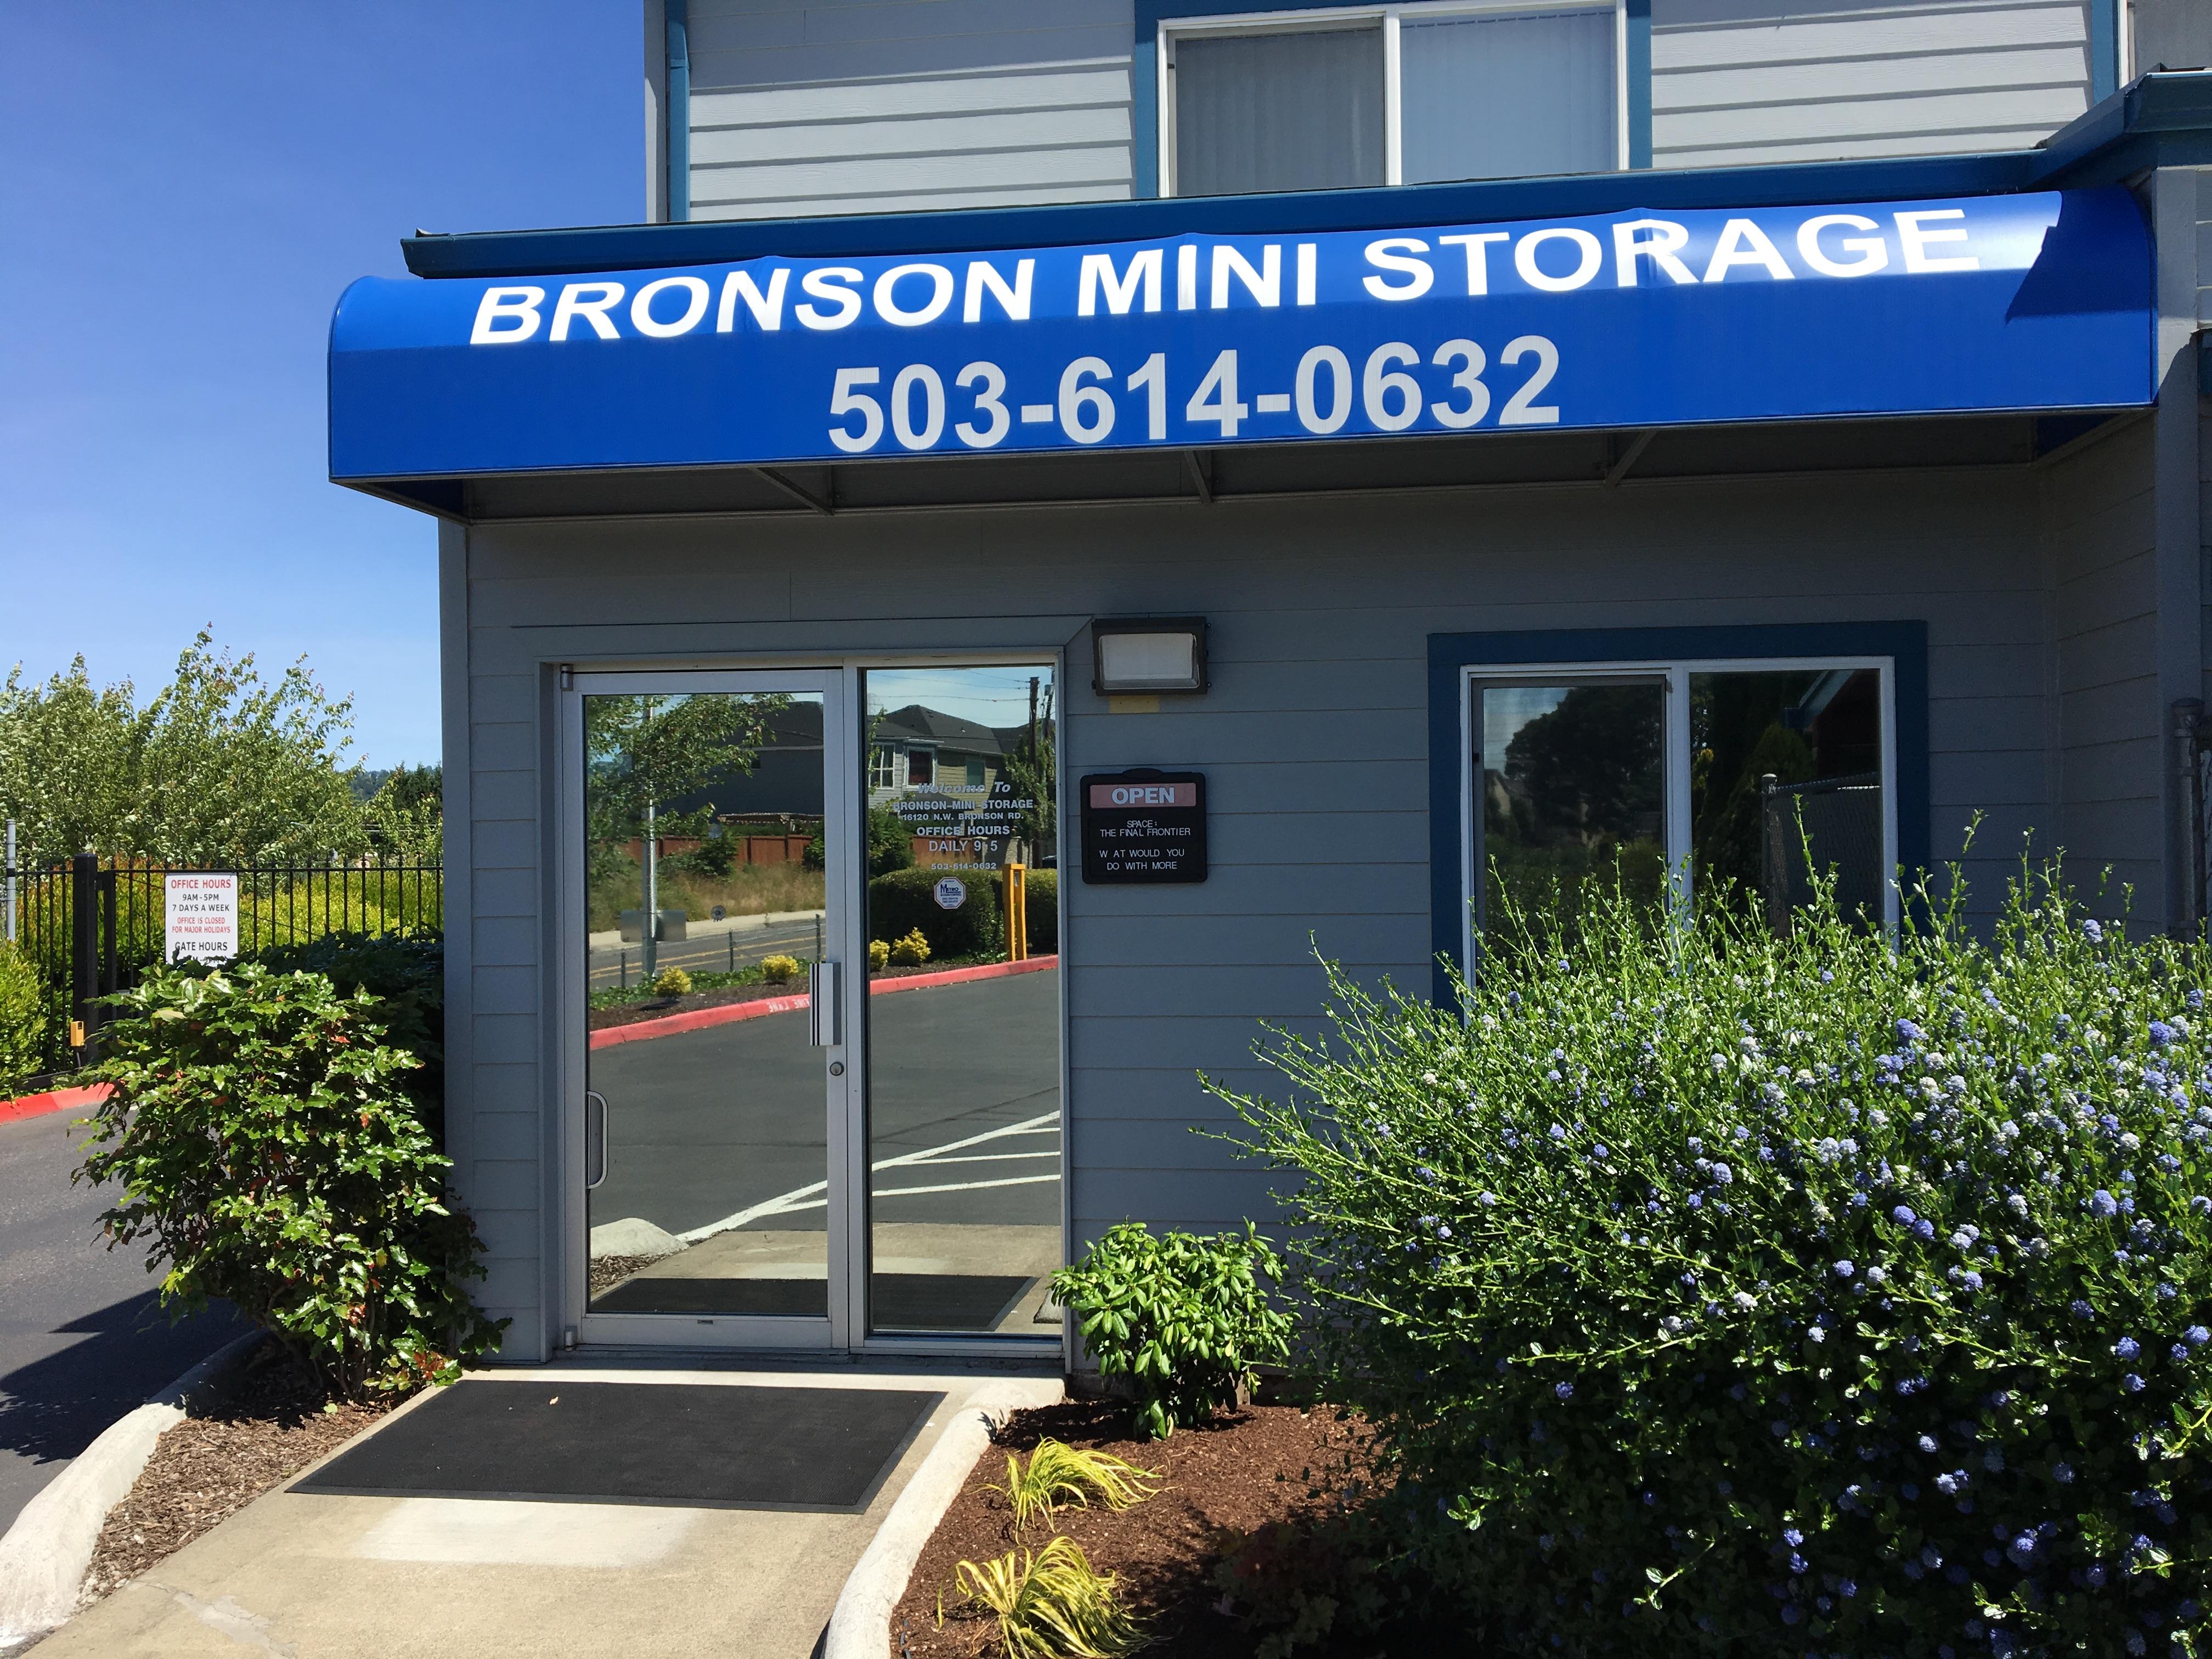 bronson self storage in Beaverton, OR